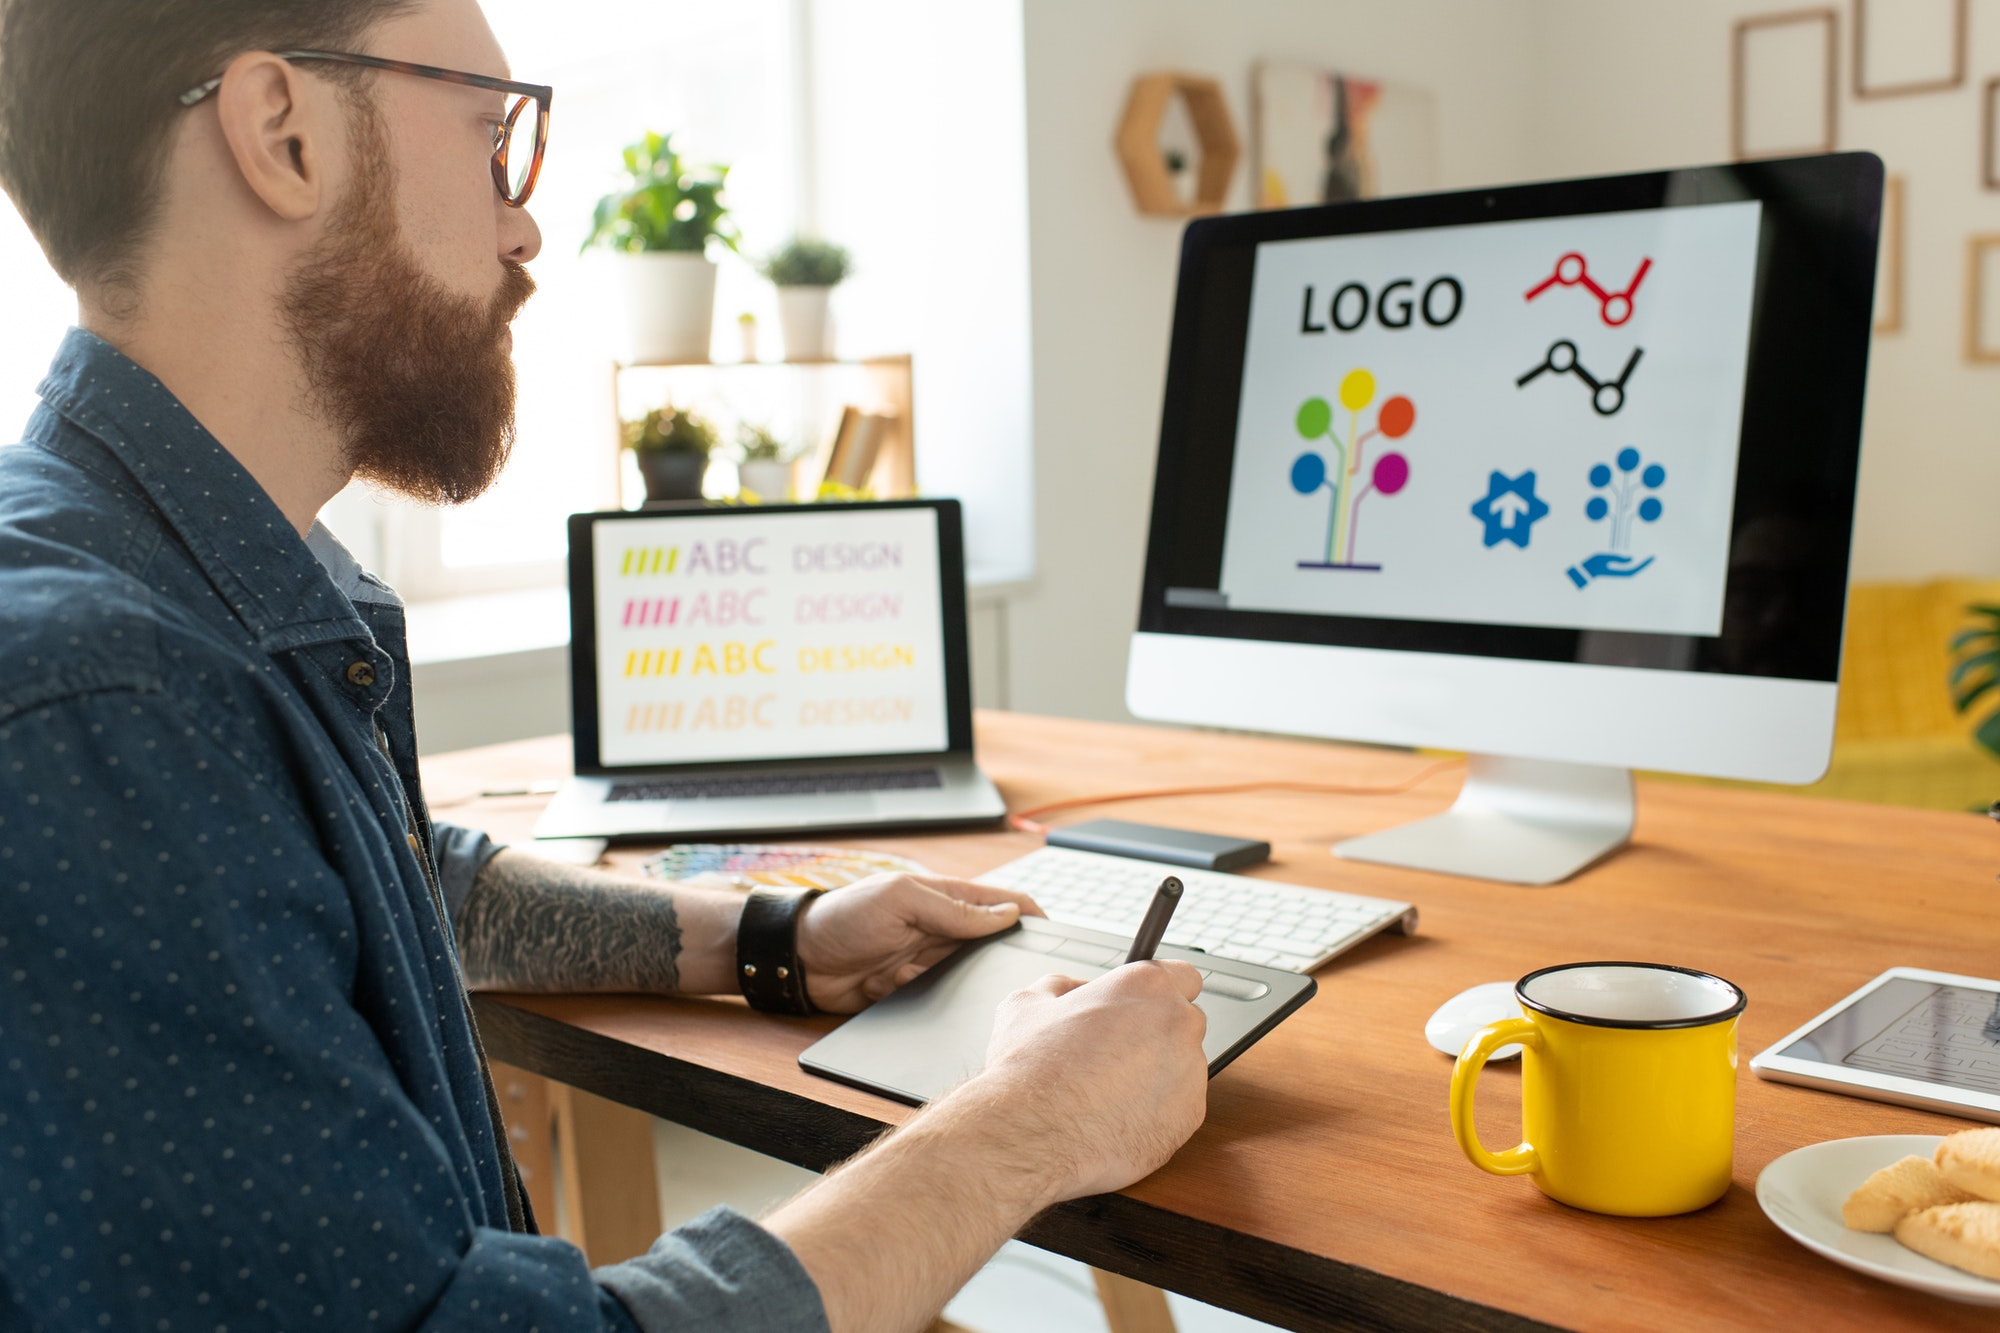 Working on website graphics